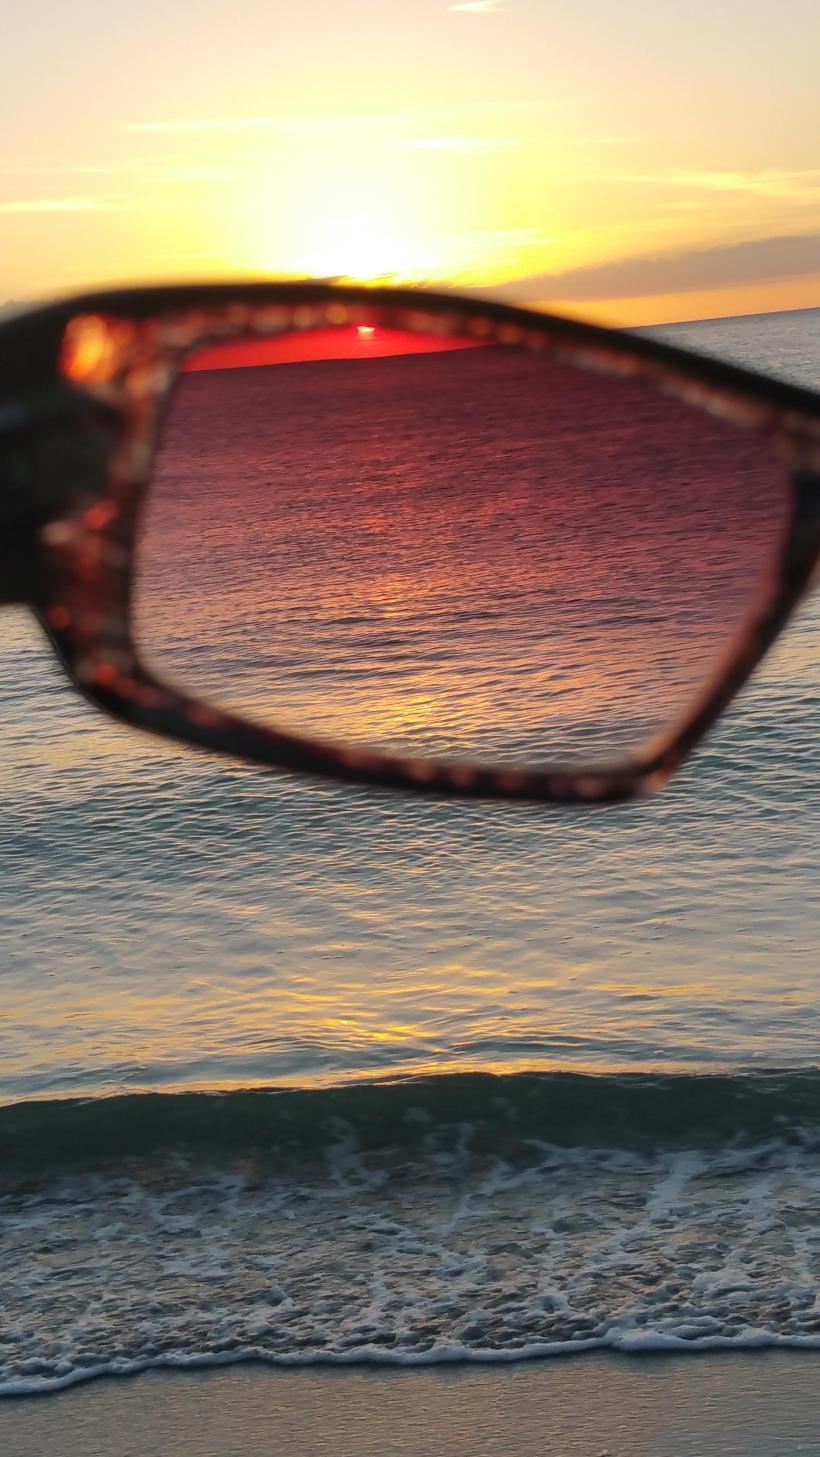 sunglass 1